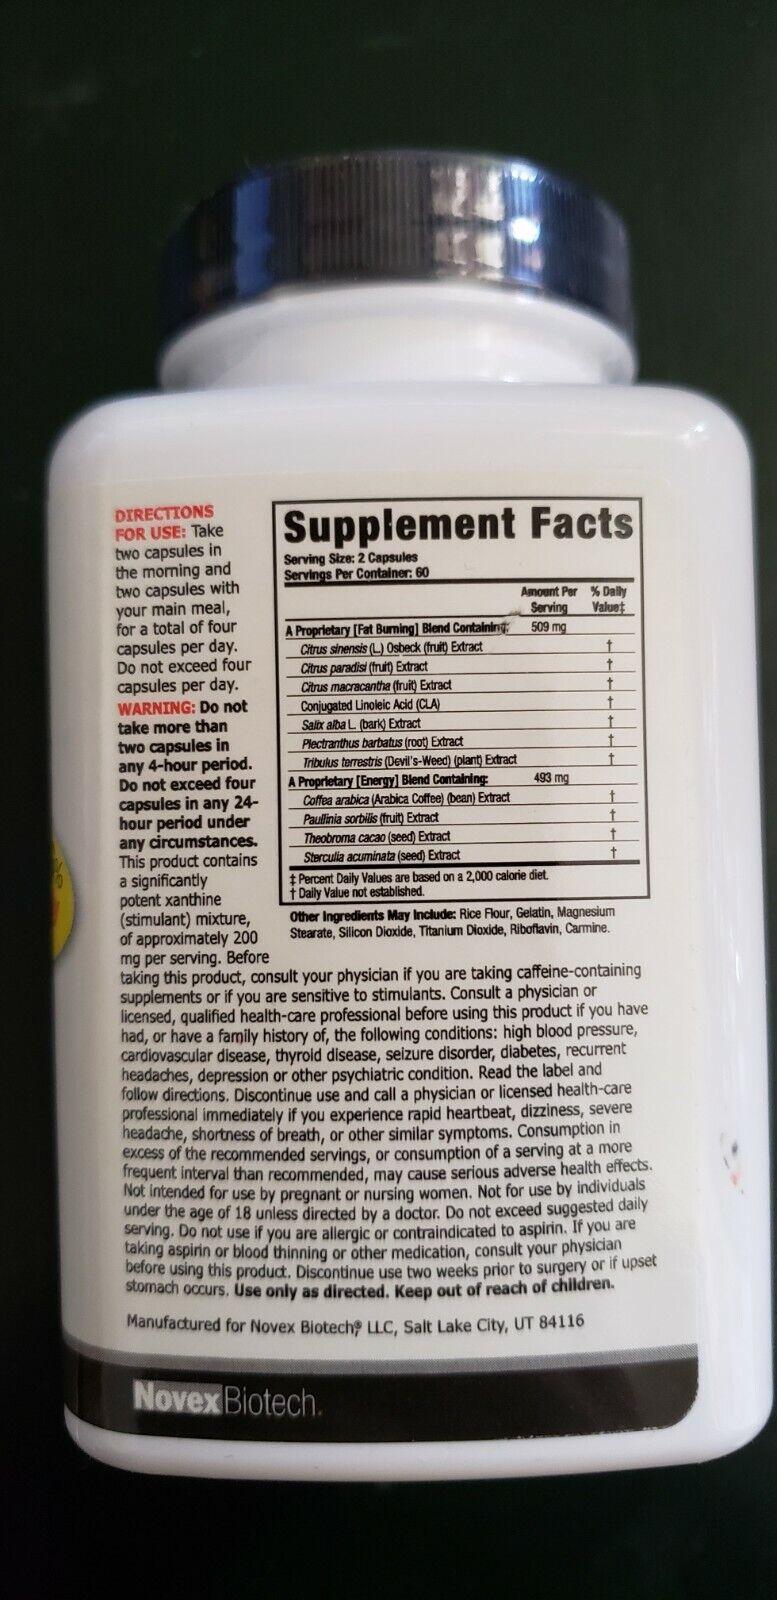 Novex Biotech - Thermodyne - 120 Capsules - 3 Phrase Fat Oxidizer - Exp 8/2021 1